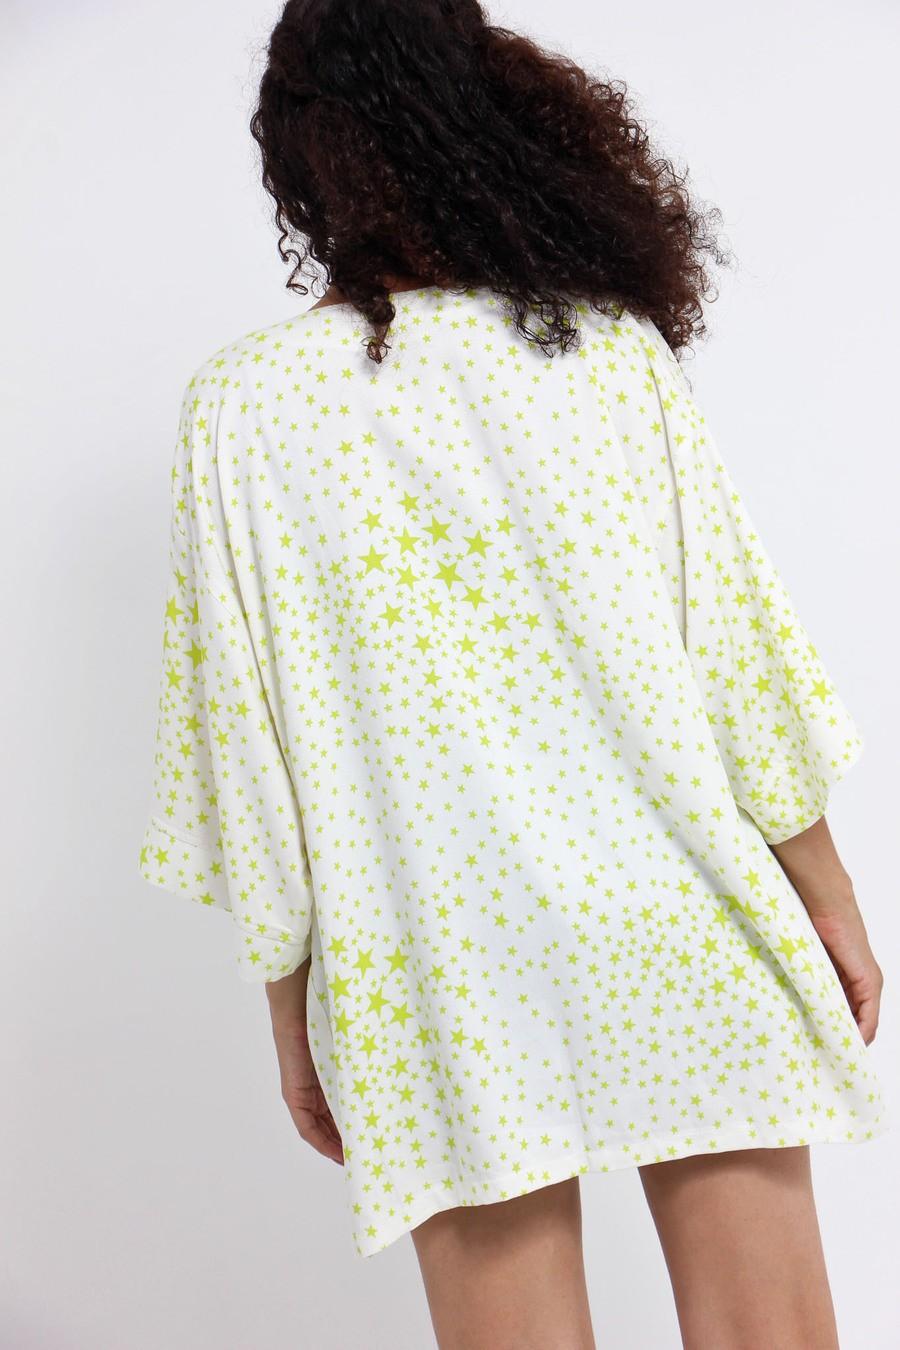 Kimono star